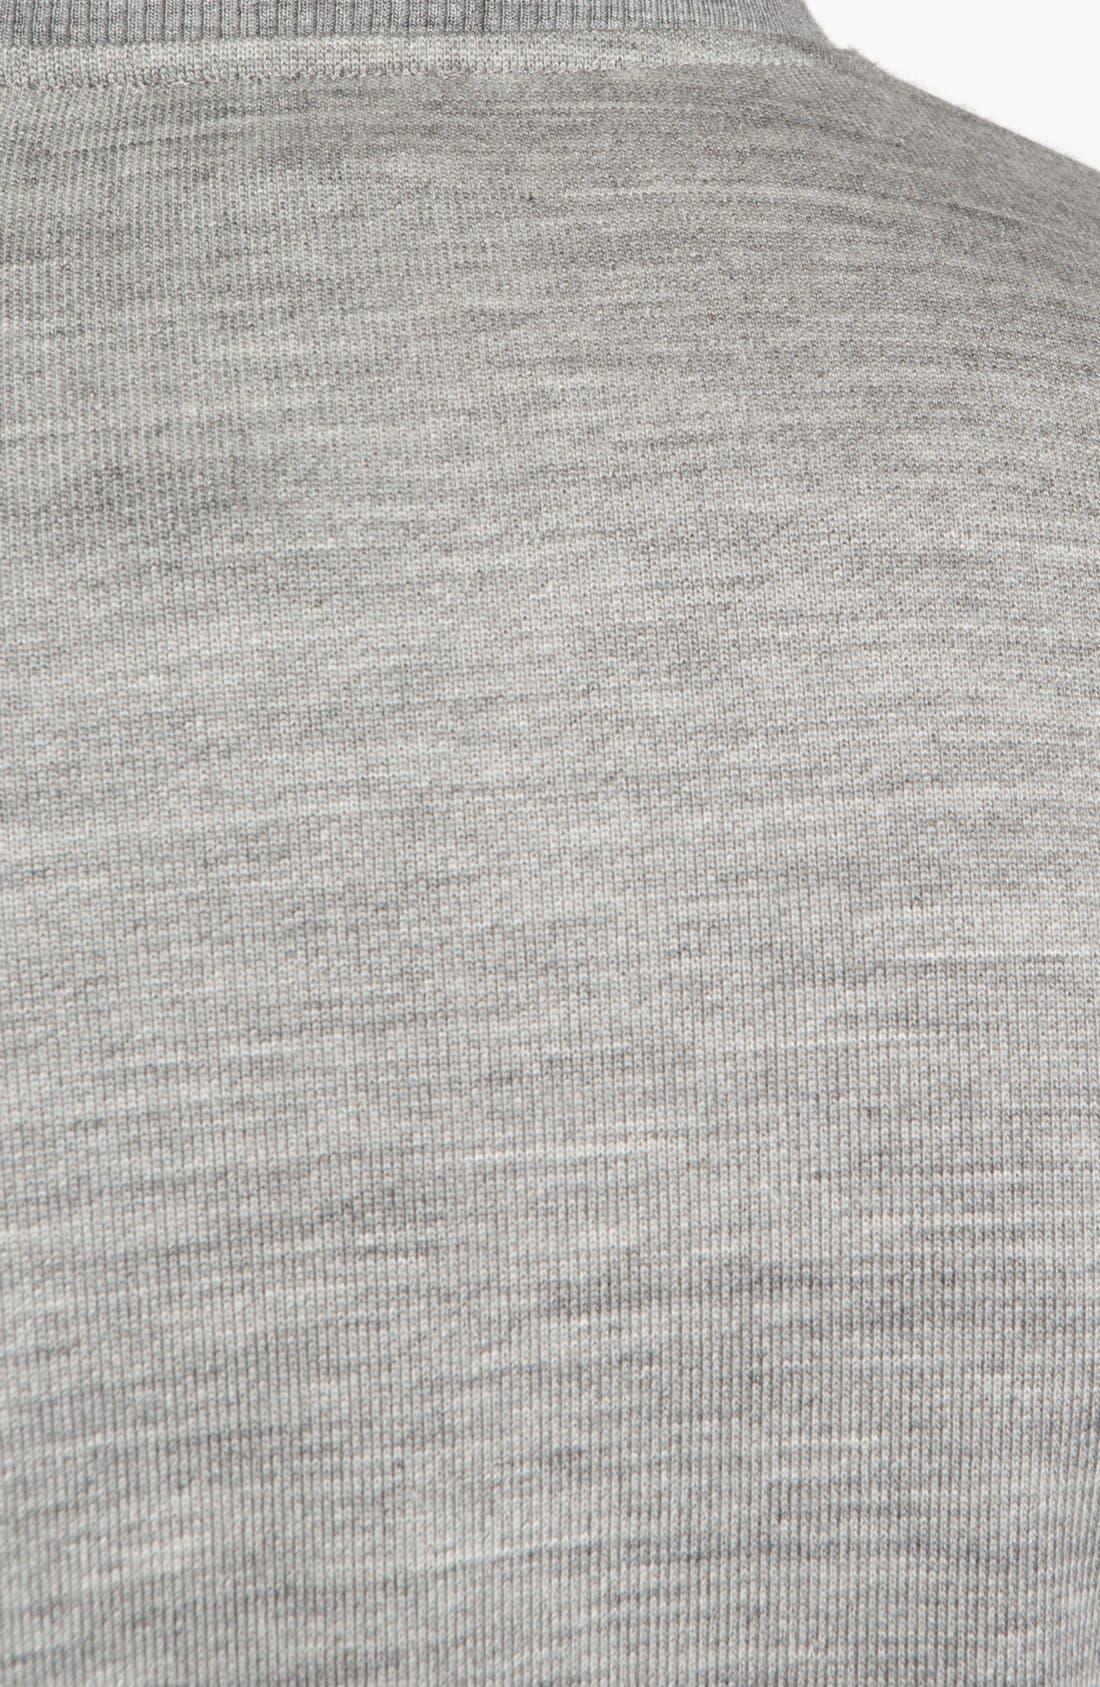 Alternate Image 3  - A.P.C. Crewneck Sweatshirt